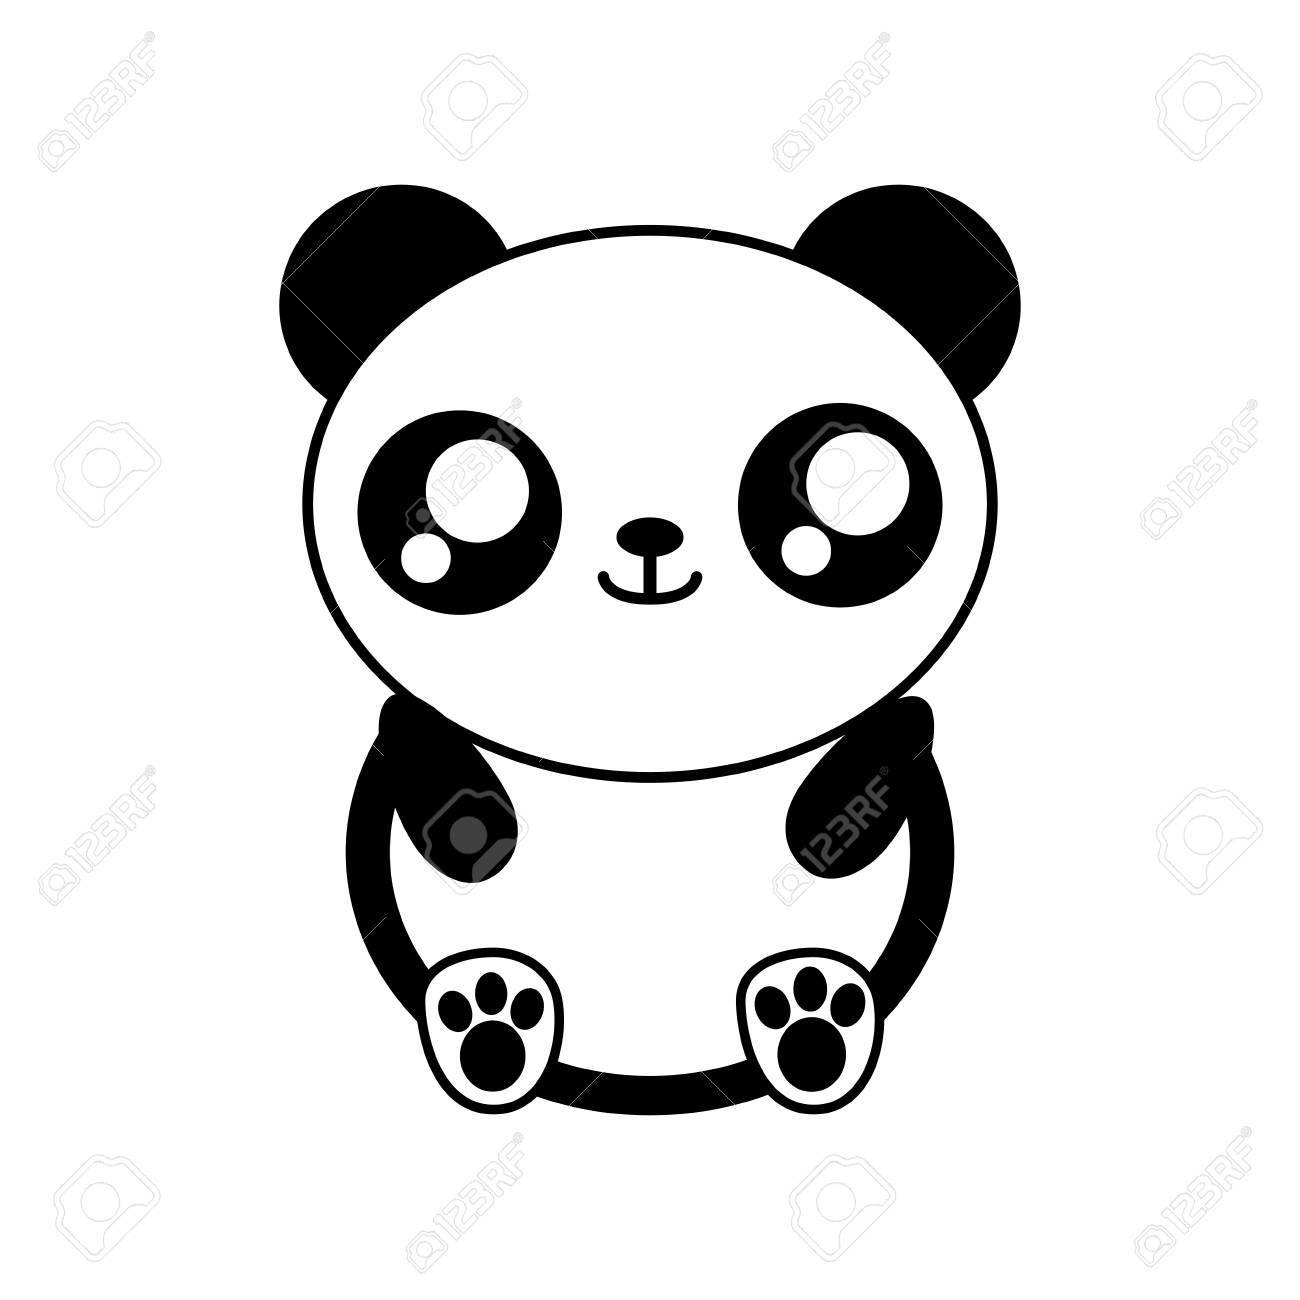 Image of: Cute Cartoon Panda Bear Kawaii Cute Animal Little Icon Isolated And Flat Illustration Stock Vector 64099822 123rfcom Panda Bear Kawaii Cute Animal Little Icon Isolated And Flat